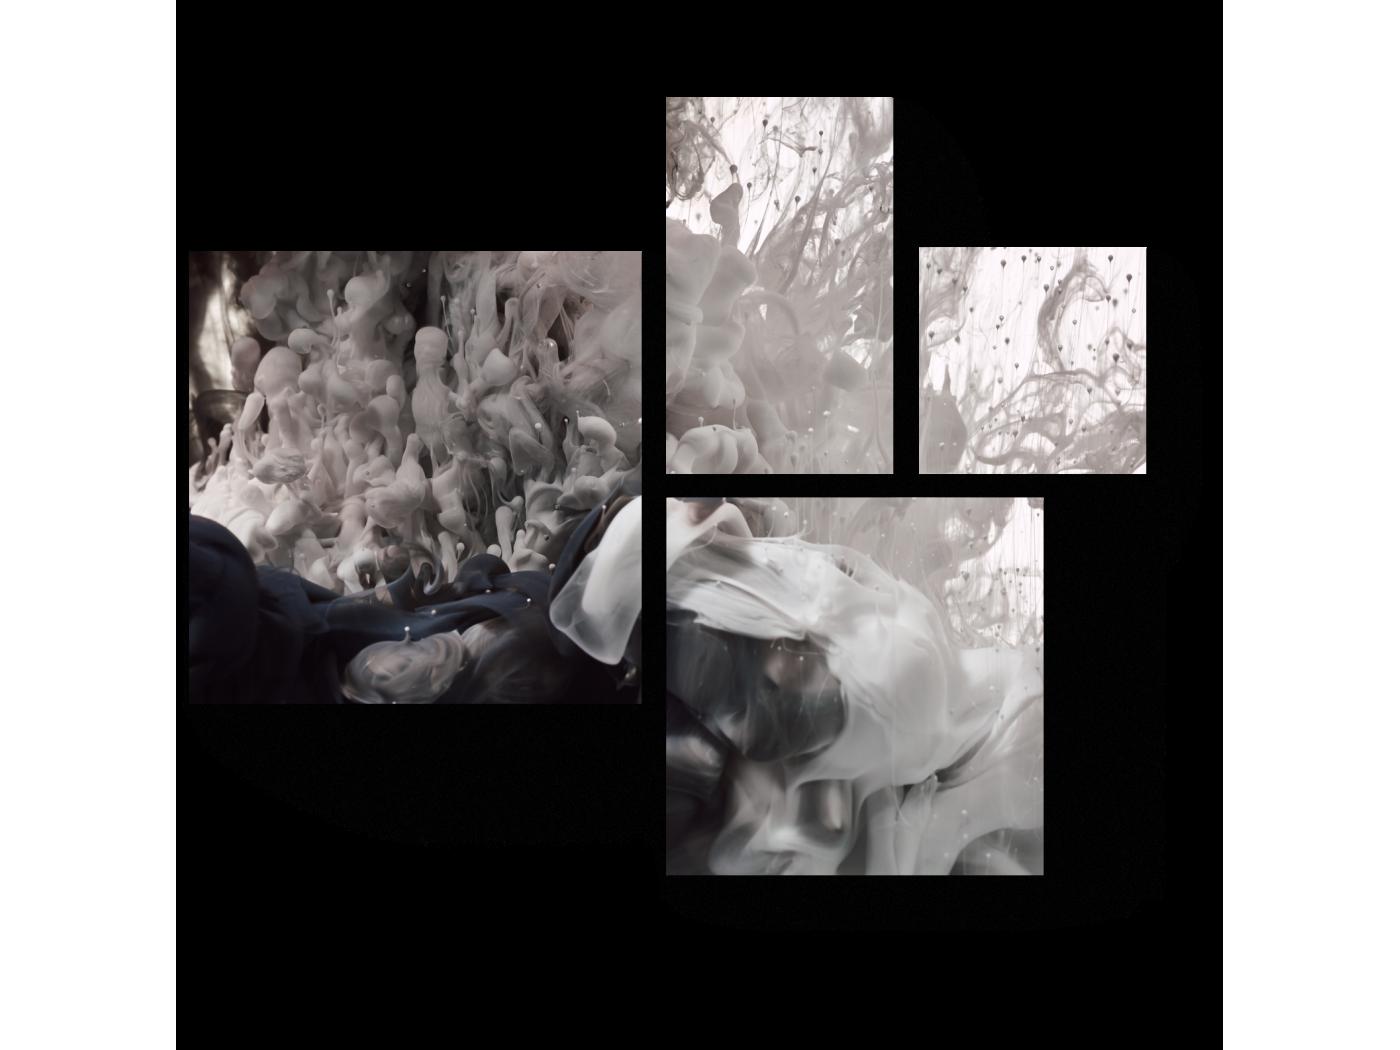 Модульная картина Монохромное слияние (72x60) фото